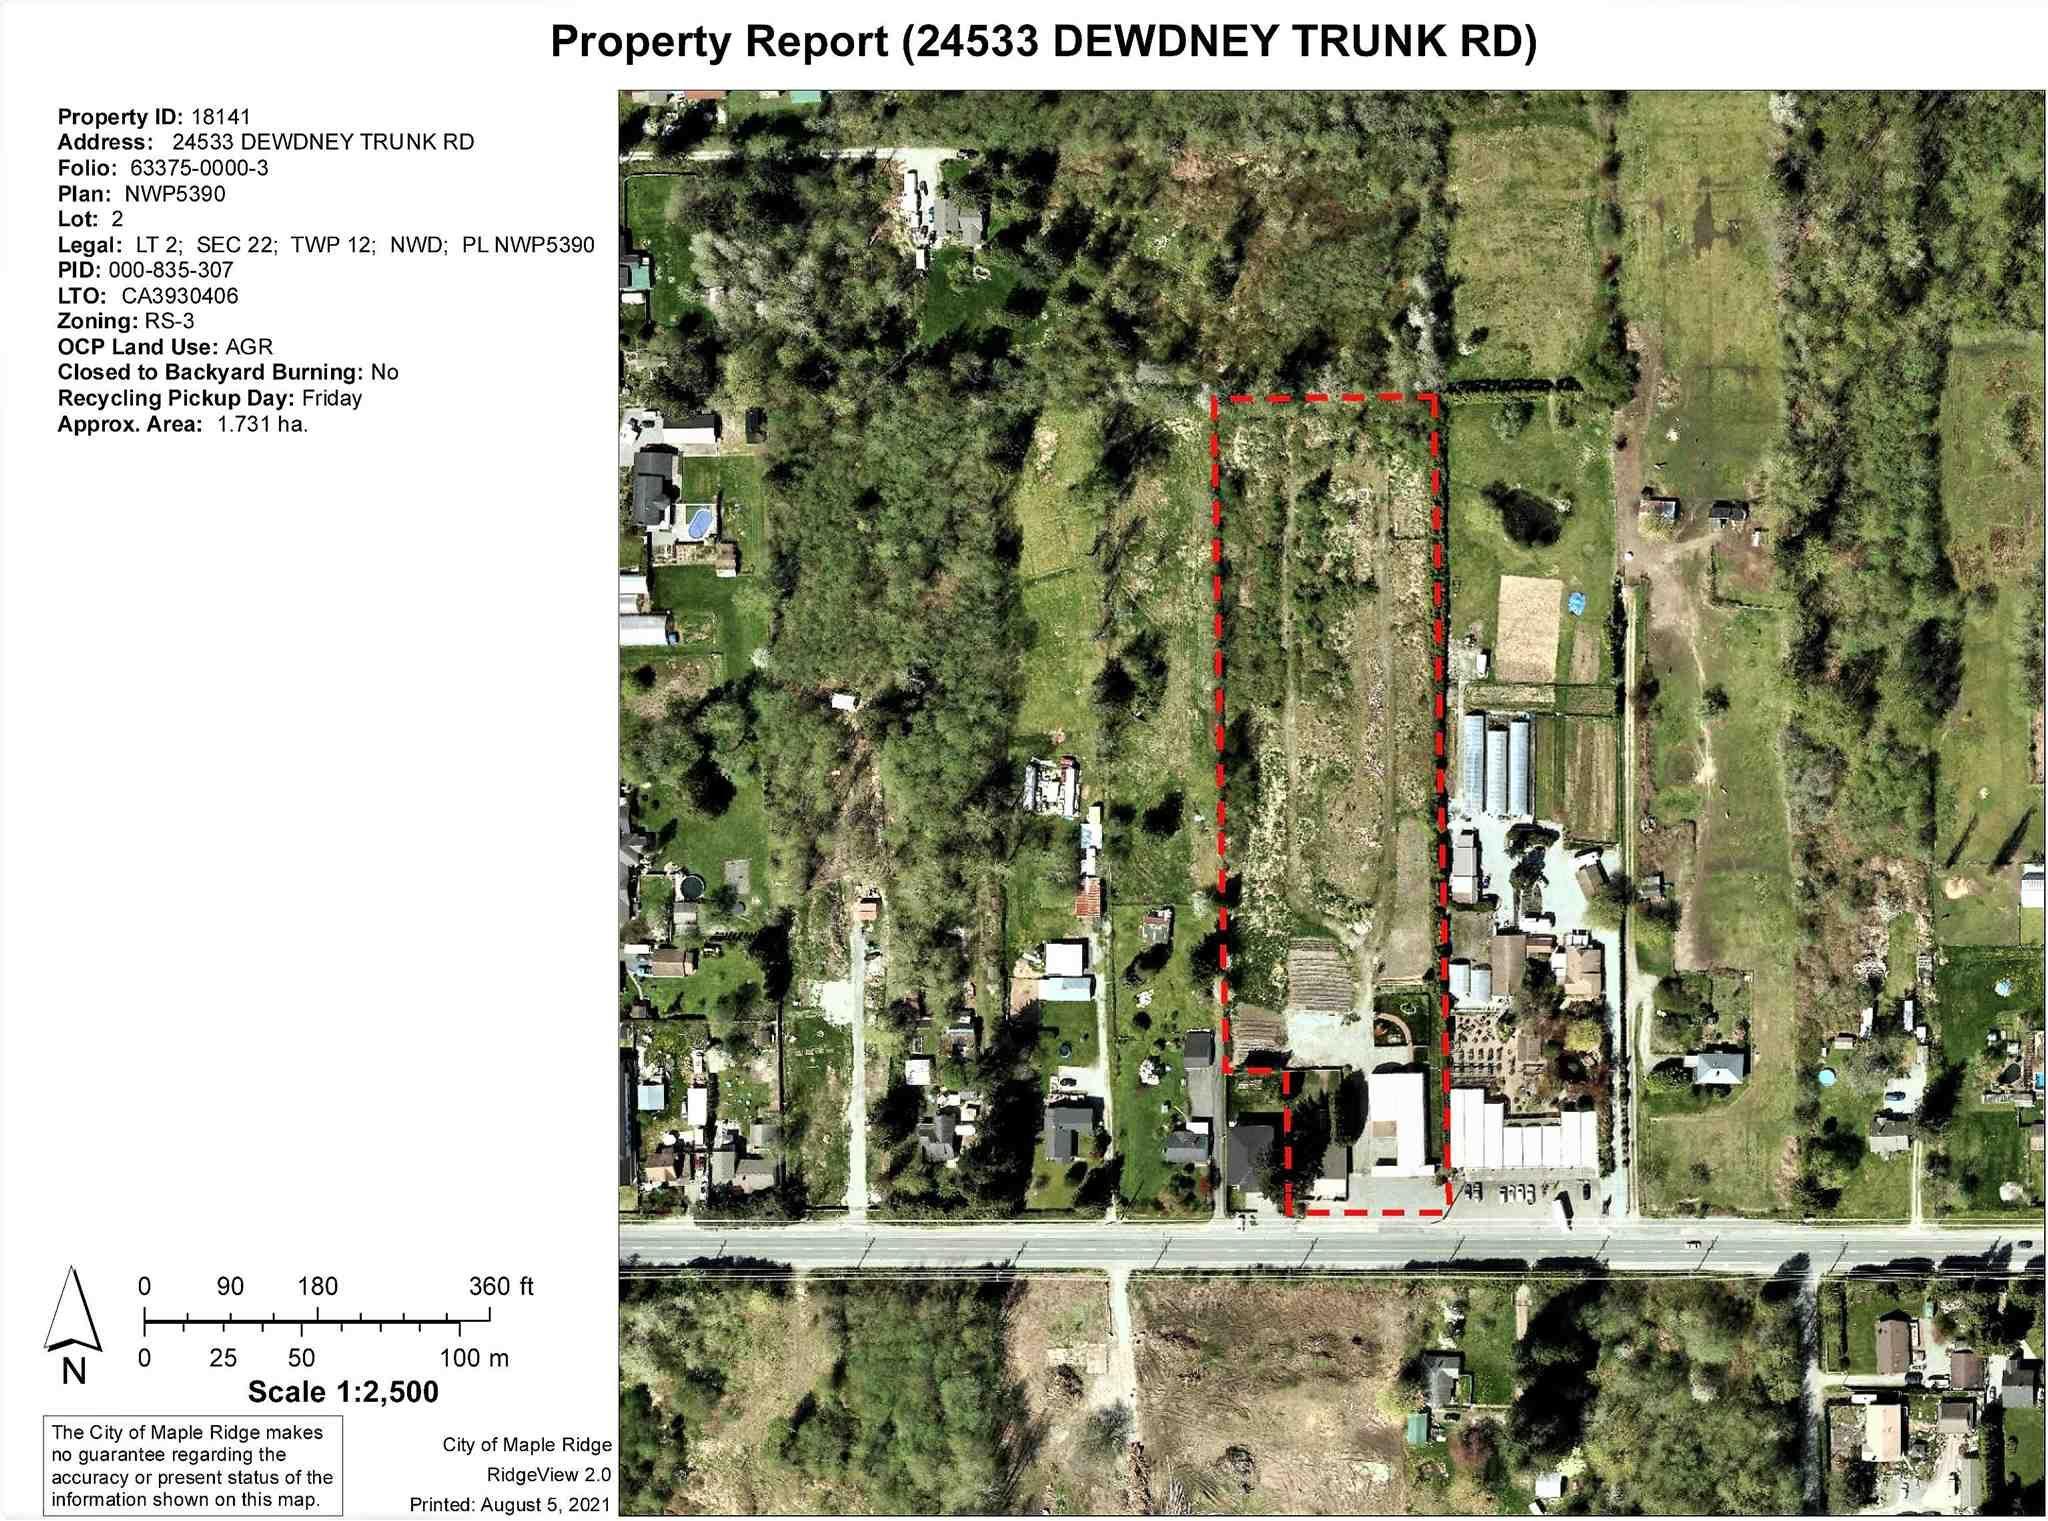 Main Photo: 24533 DEWDNEY TRUNK Road in Maple Ridge: Websters Corners House for sale : MLS®# R2607299